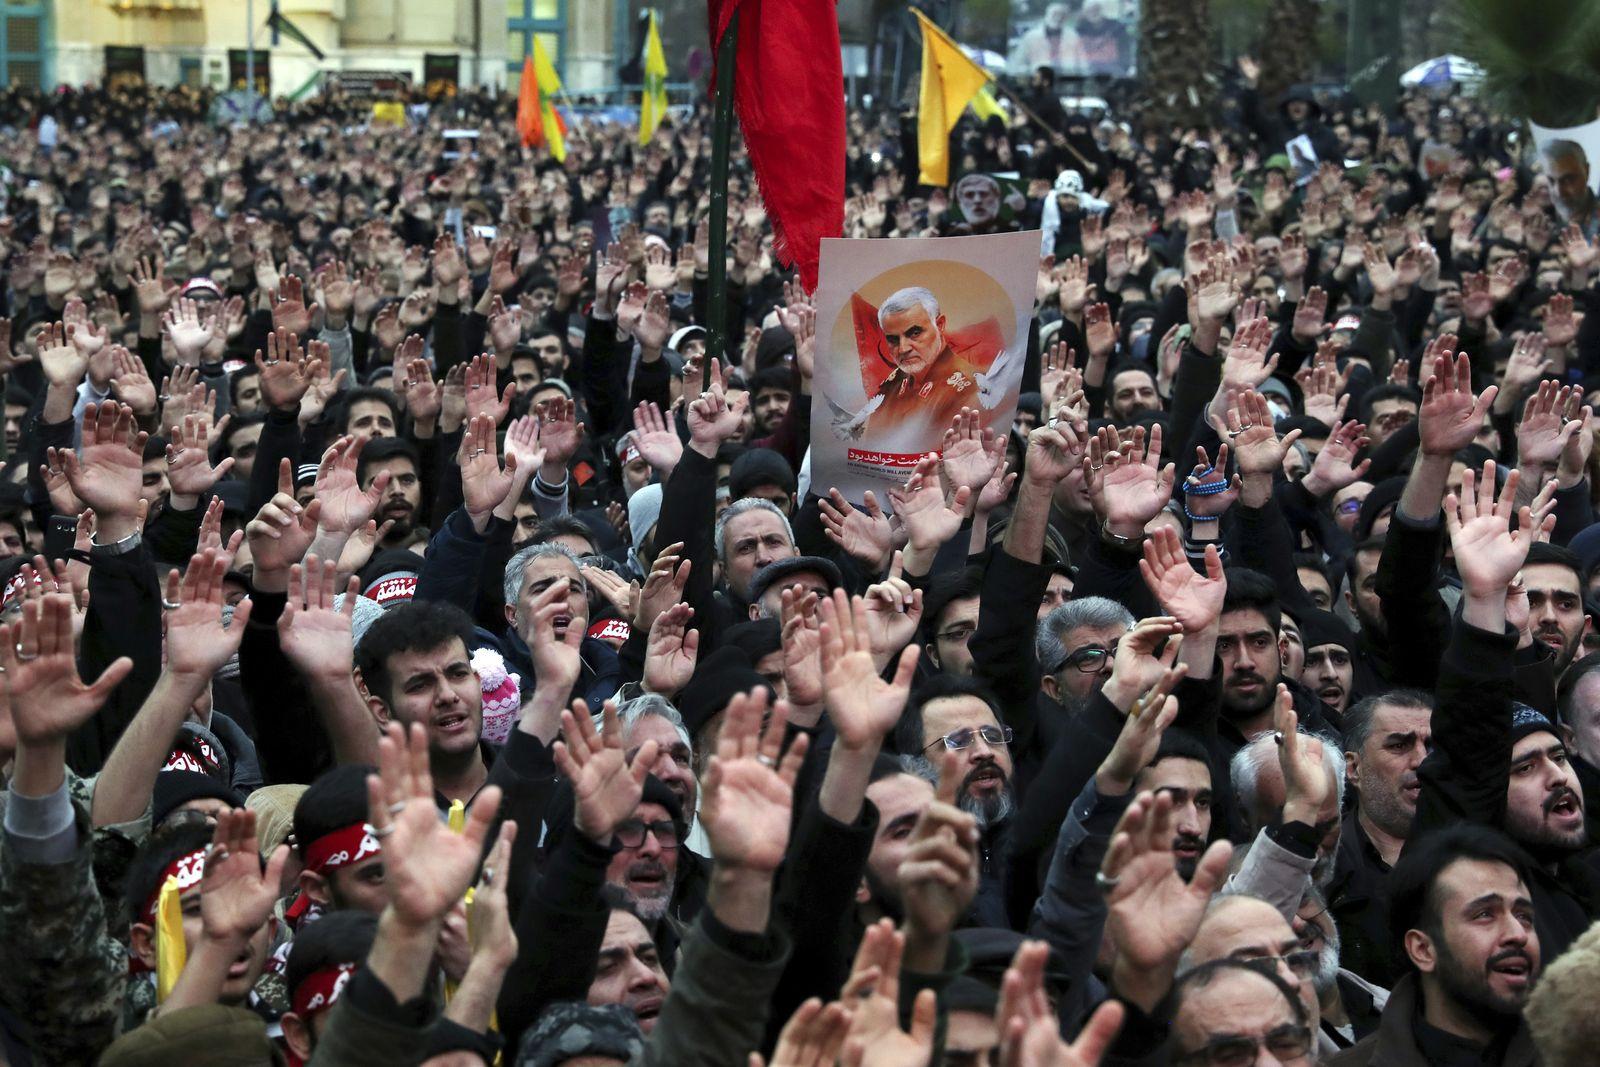 Konflikt Iran-USA - Demonstration im Iran